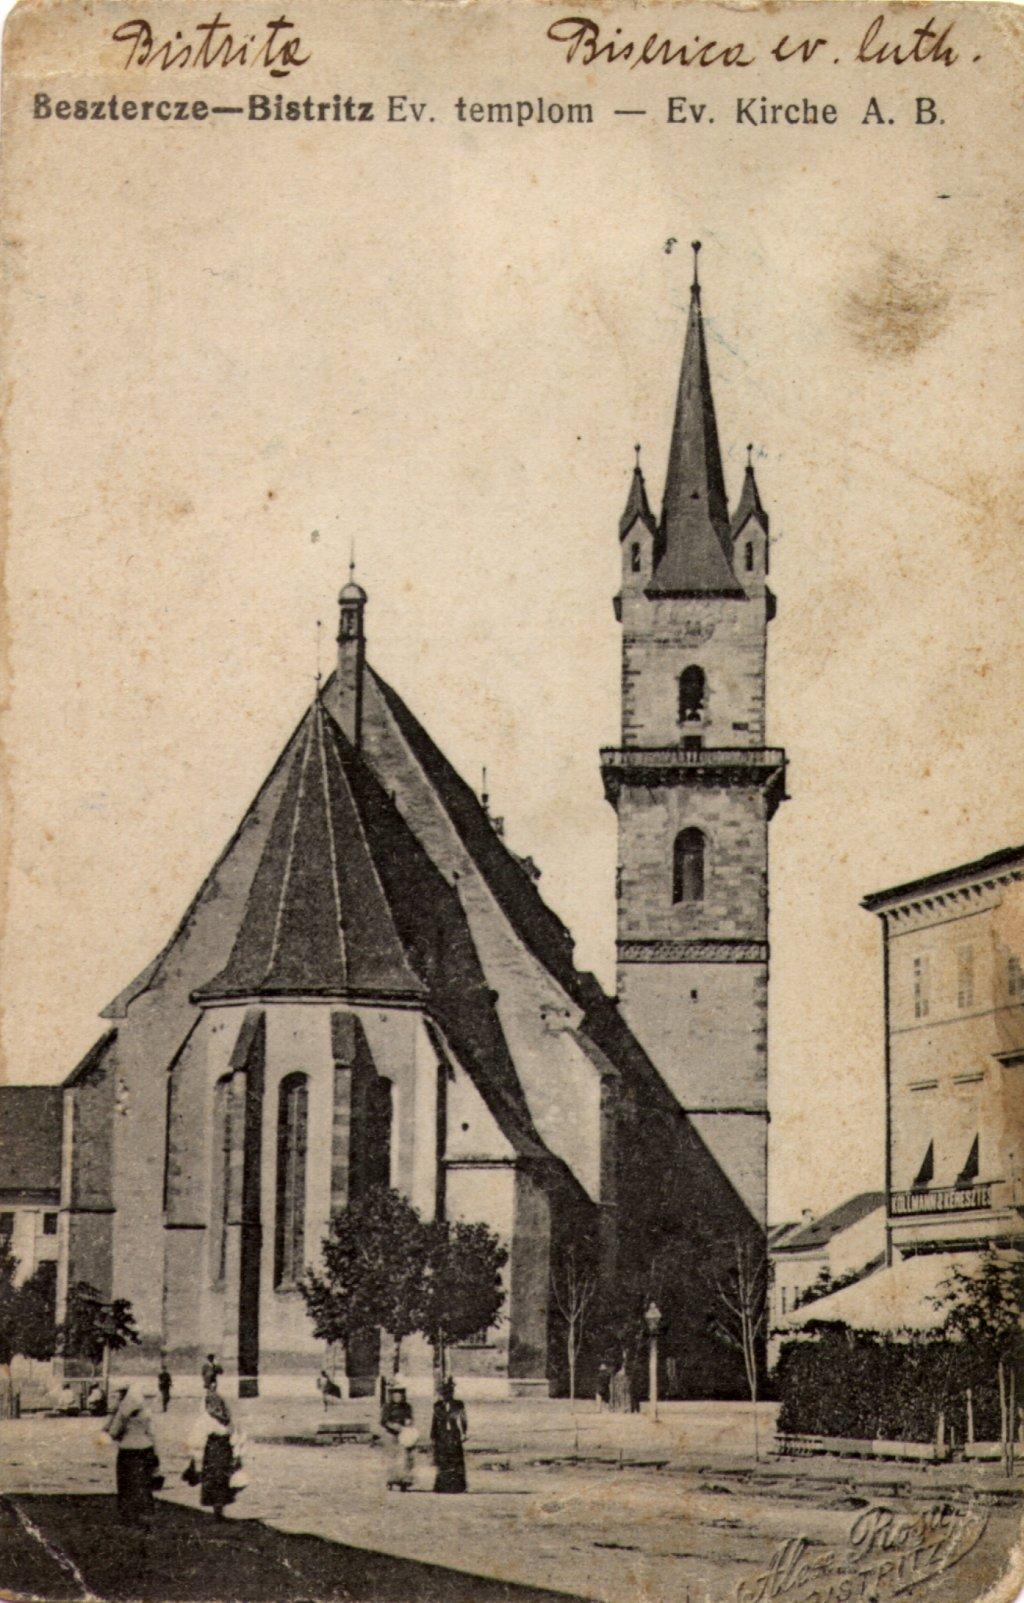 Biserica Evanghelică Bistriţa3.jpg